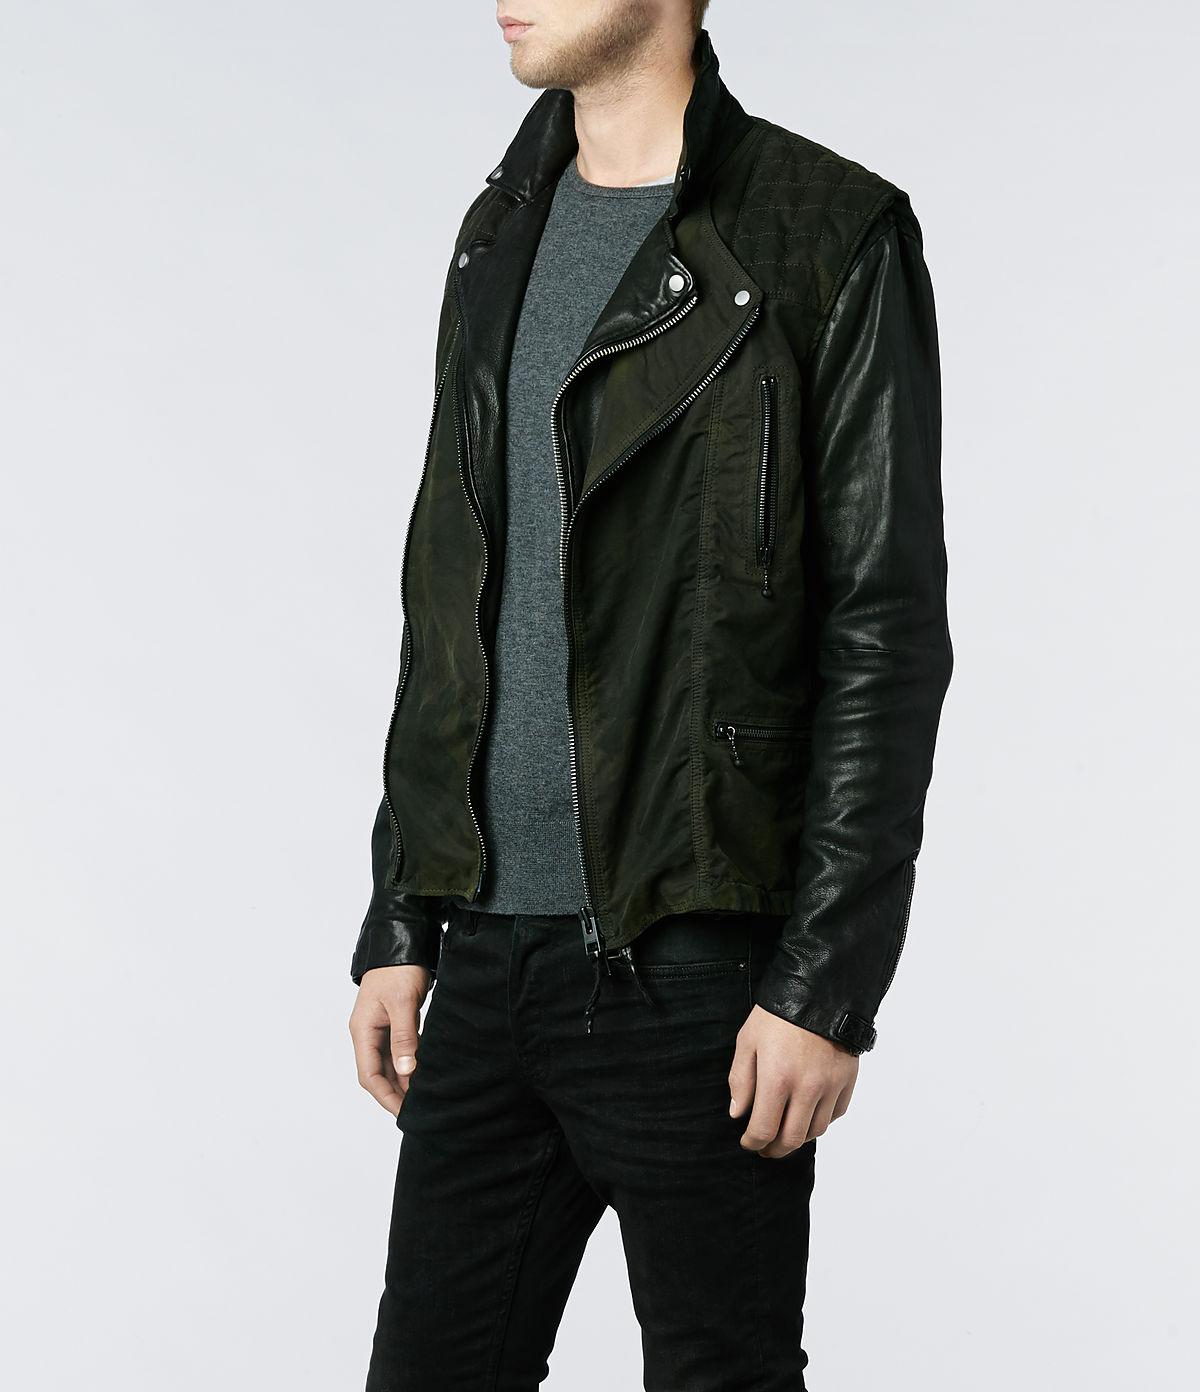 AllSaints Roule Leather Biker Jacket in Black for Men